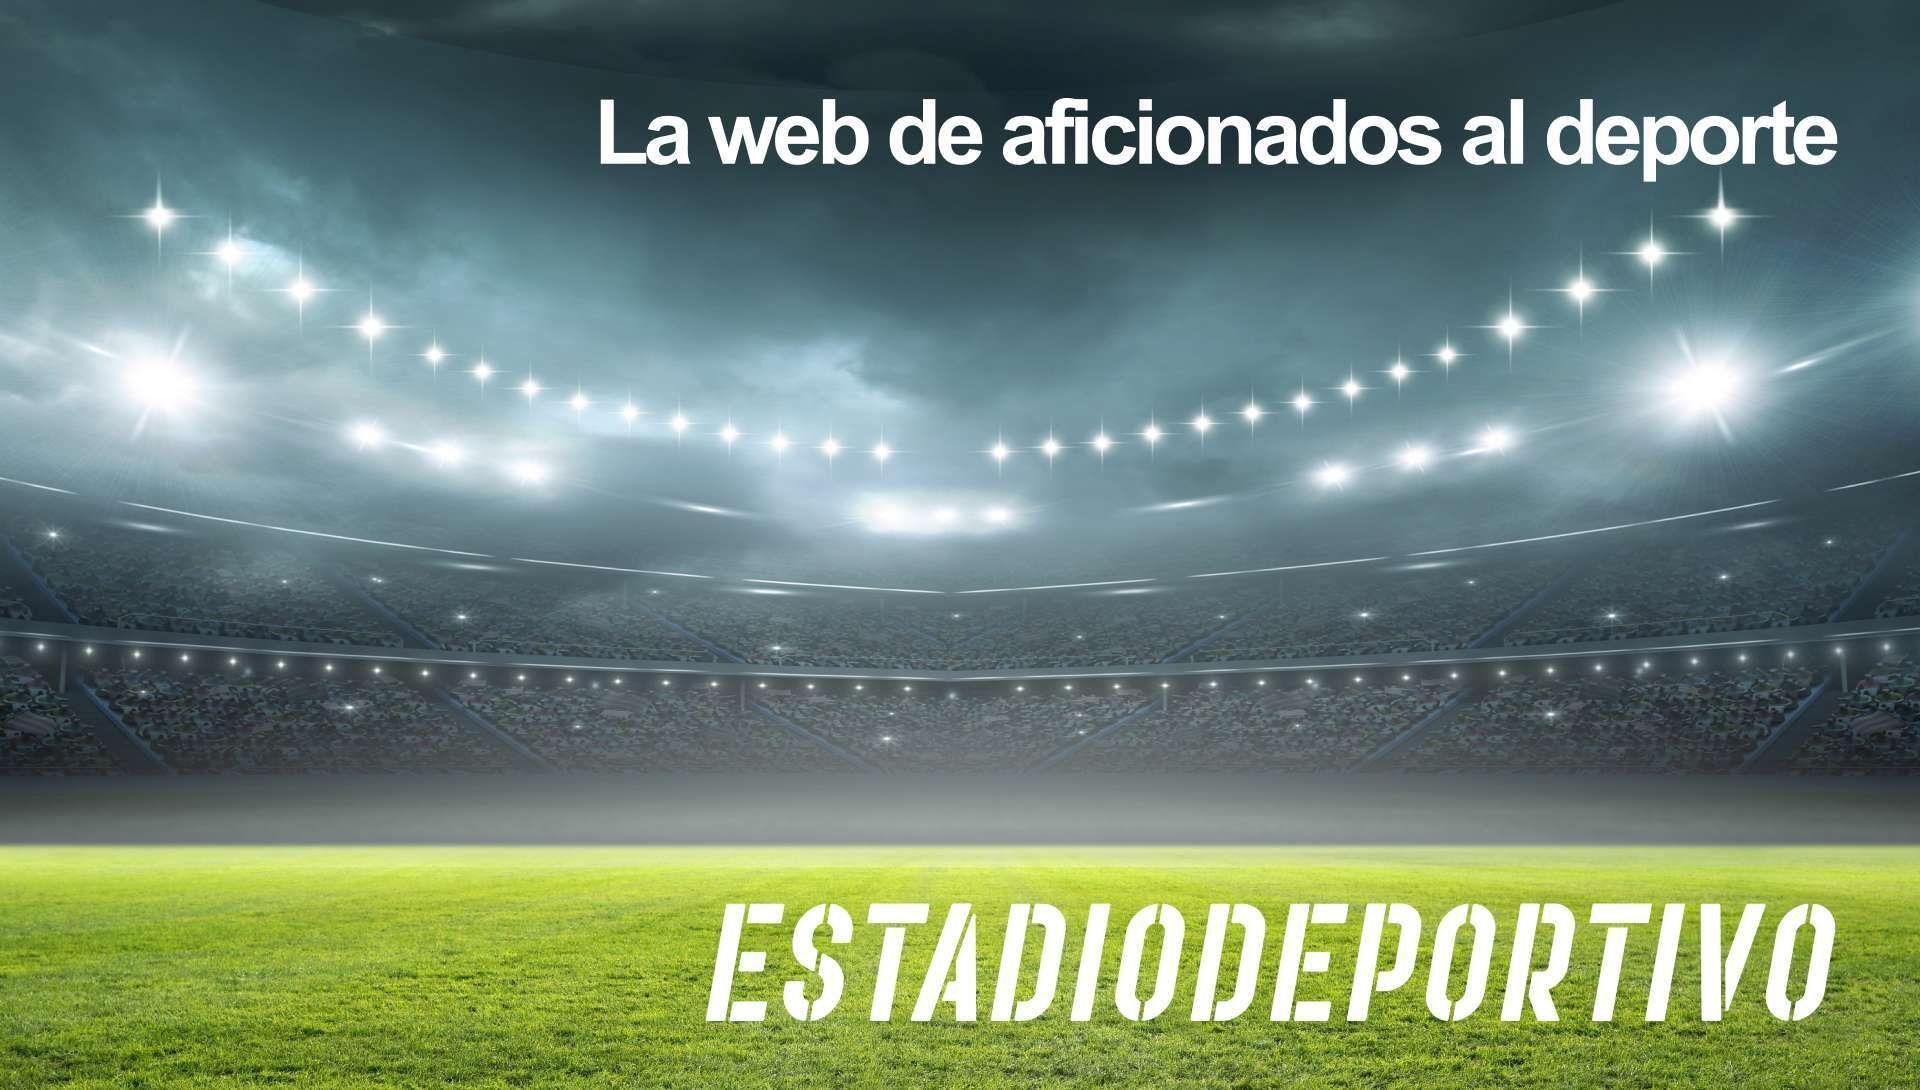 Las portadas de la prensa del sábado 26 de junio